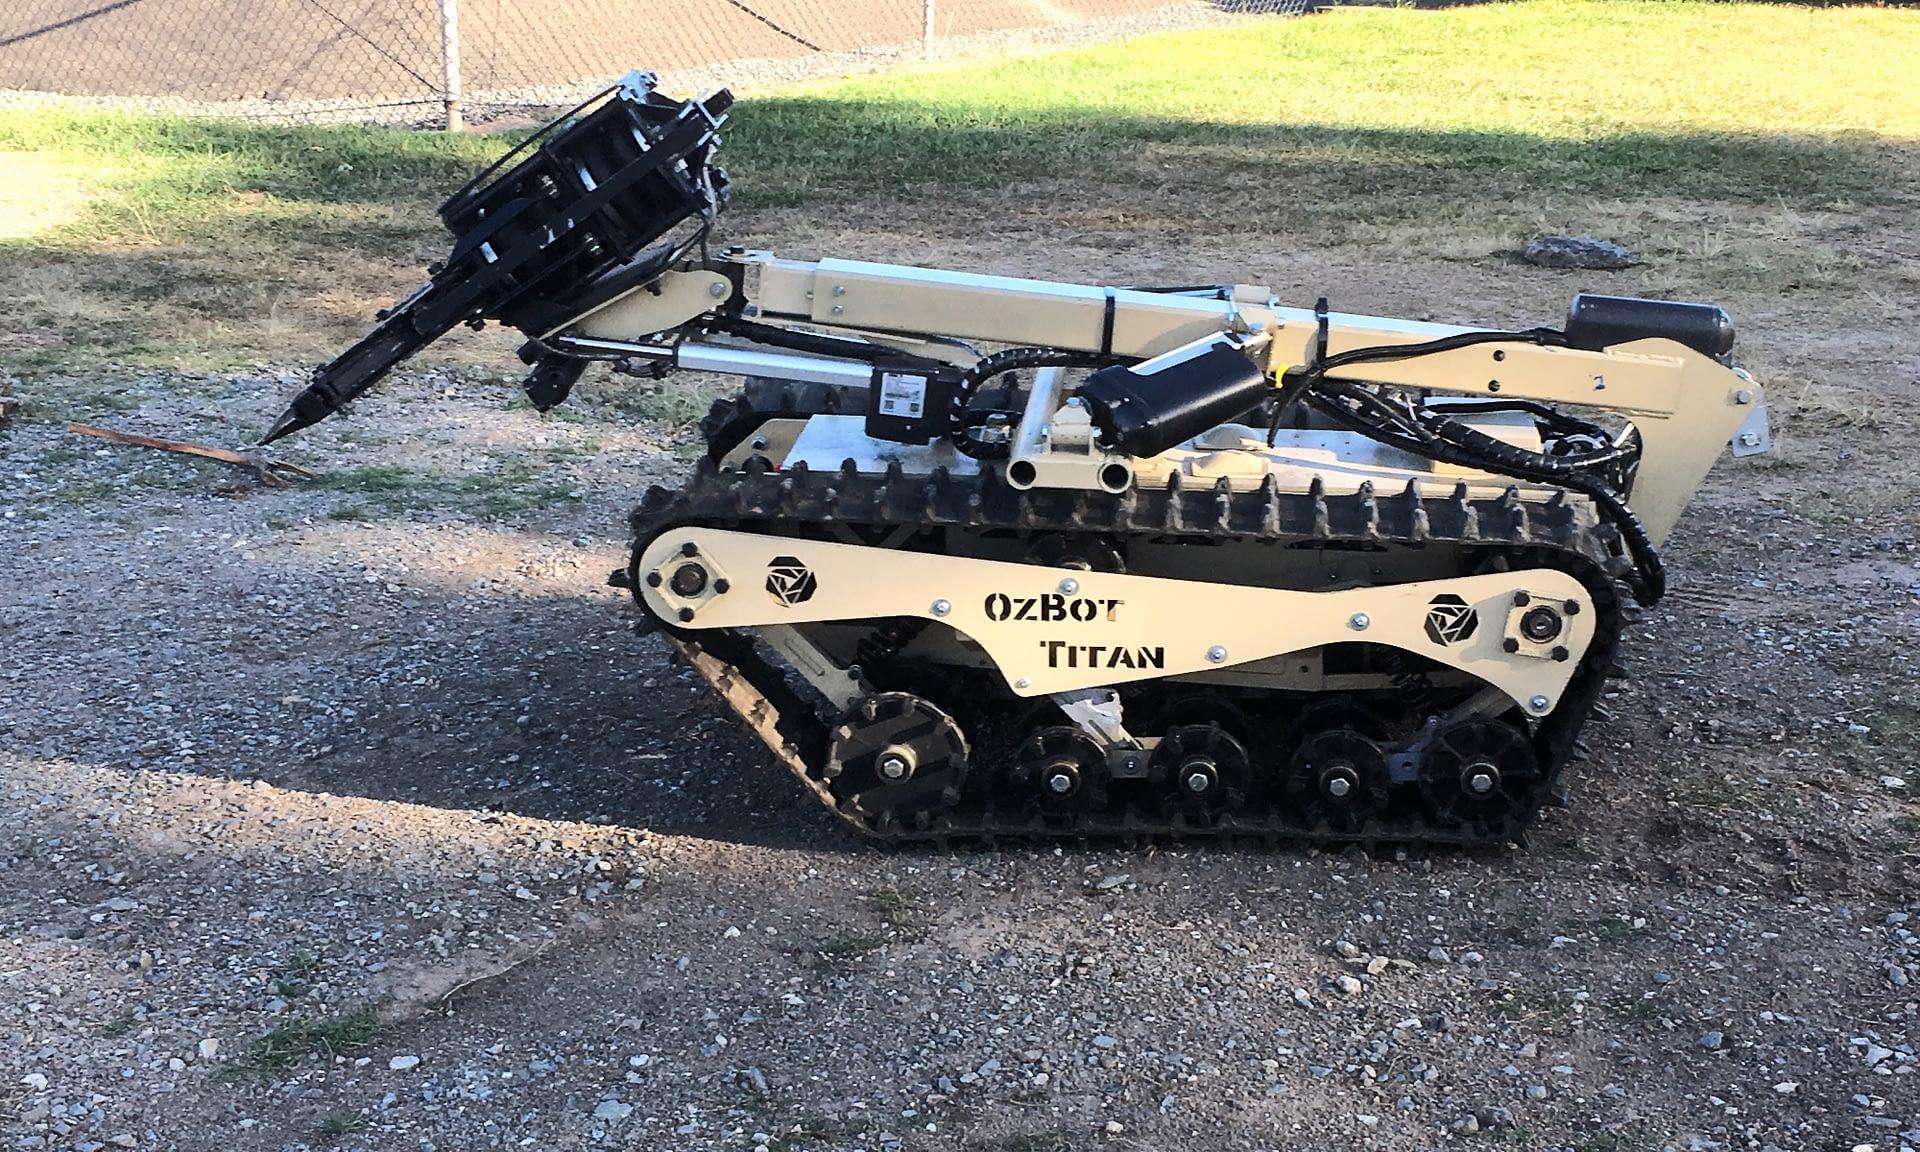 Ozbot Titan: the lifesaving police robot